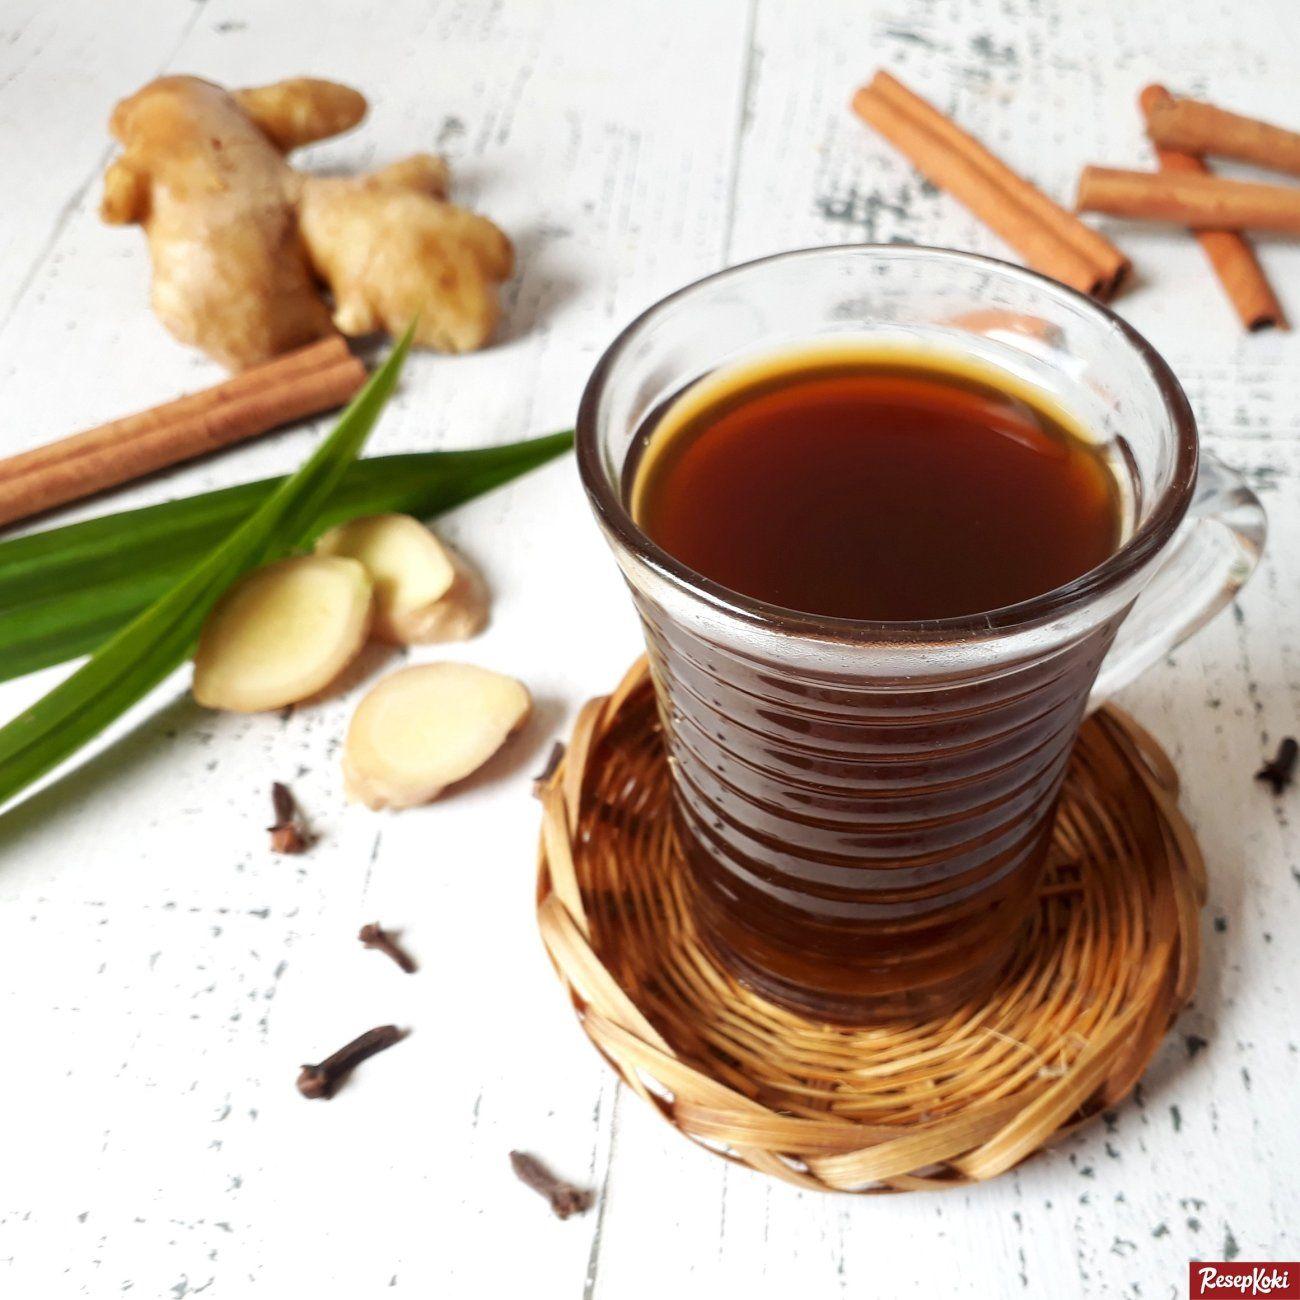 Bandrek Simpel Hangat Sedap Murah Meriah Resep Resepkoki Kayu Manis Resep Resep Minuman